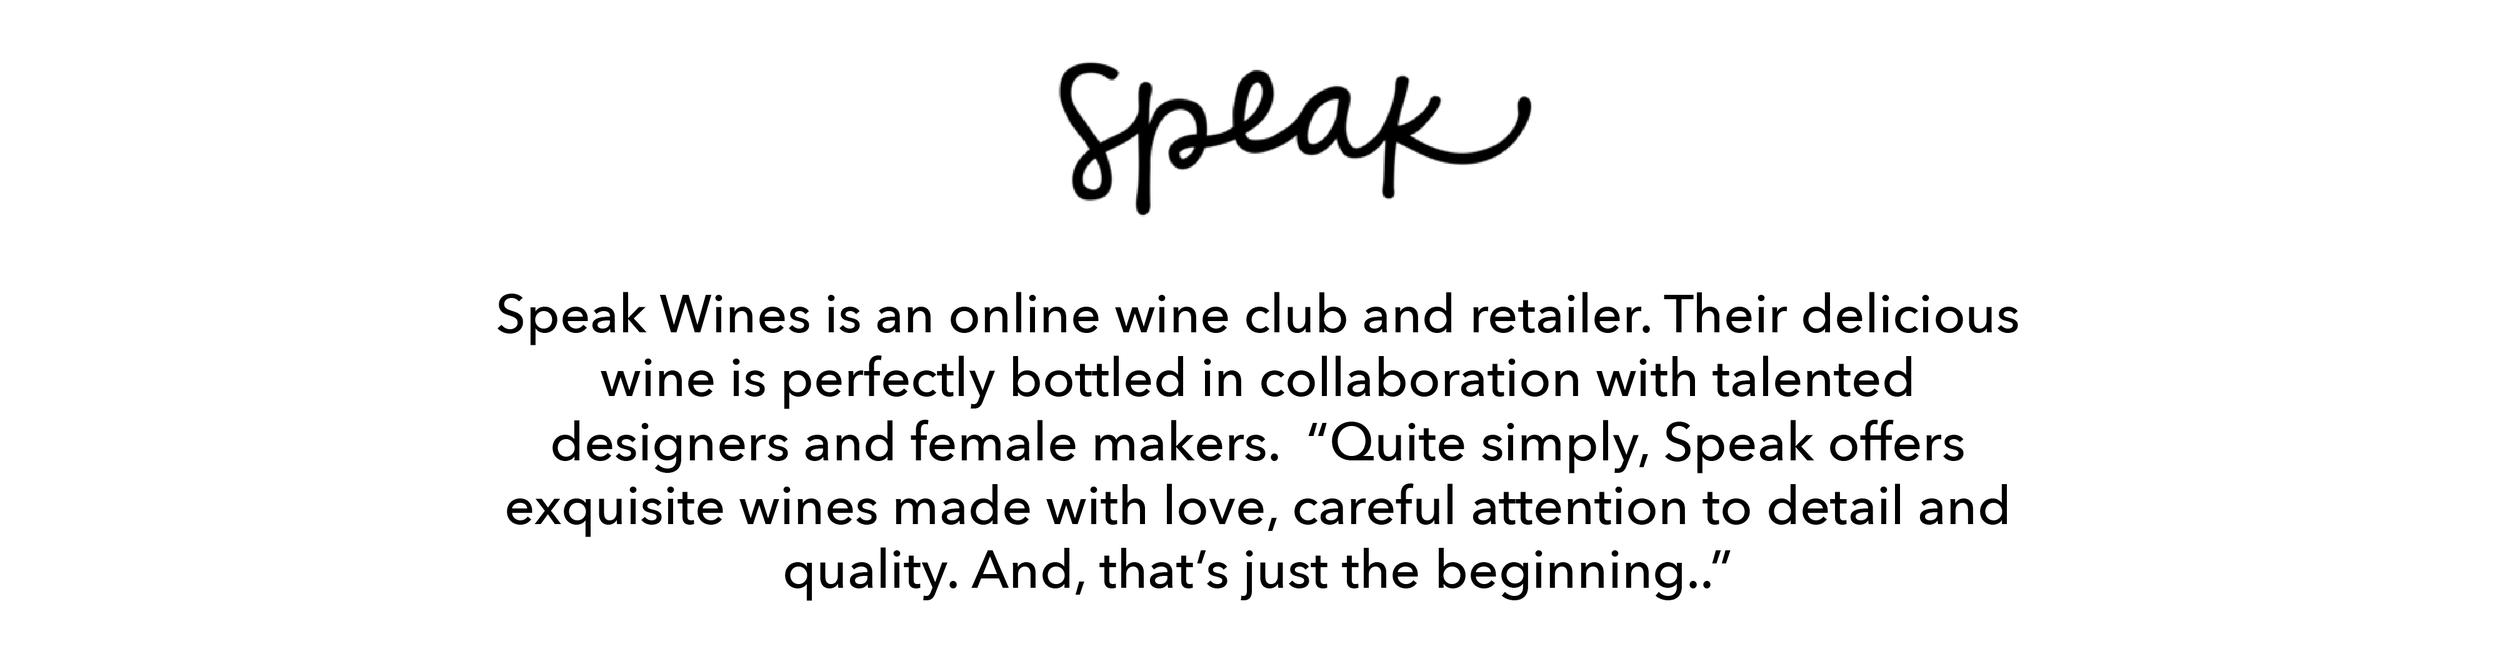 Speak Wines-01.png